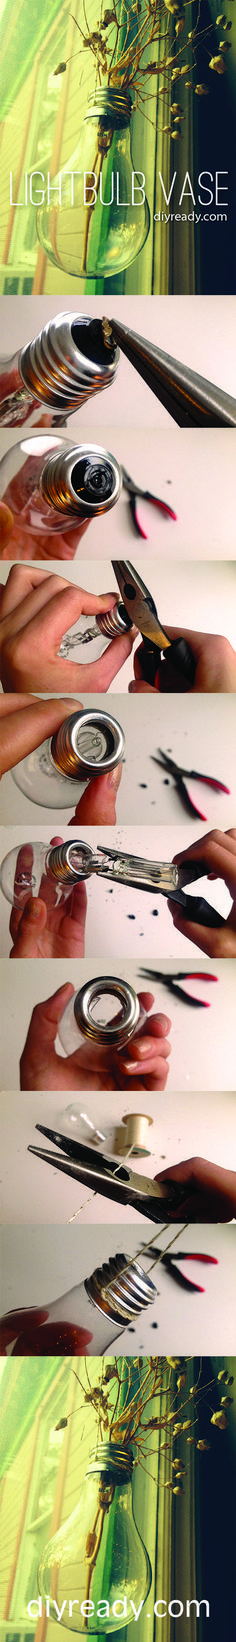 How to make a hanging lightbulb vase. Super easy DIY project idea! http://diyready.com/make-hanging-lightbulb-planter/